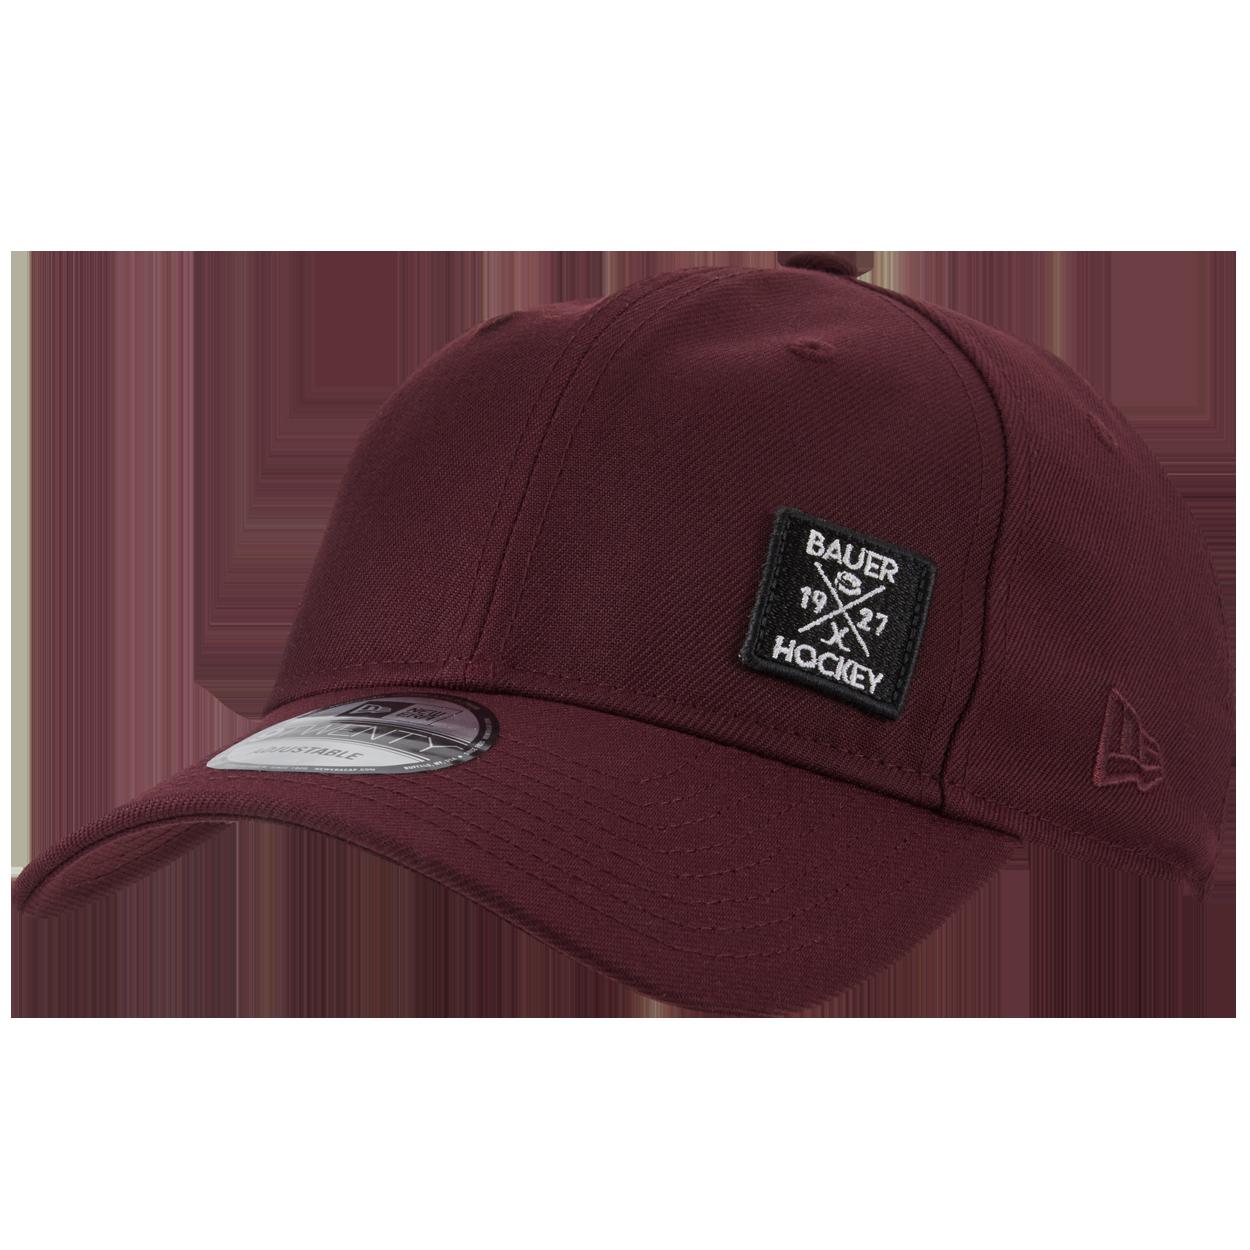 New Era 9TWENTY Adjustable Twill Hat